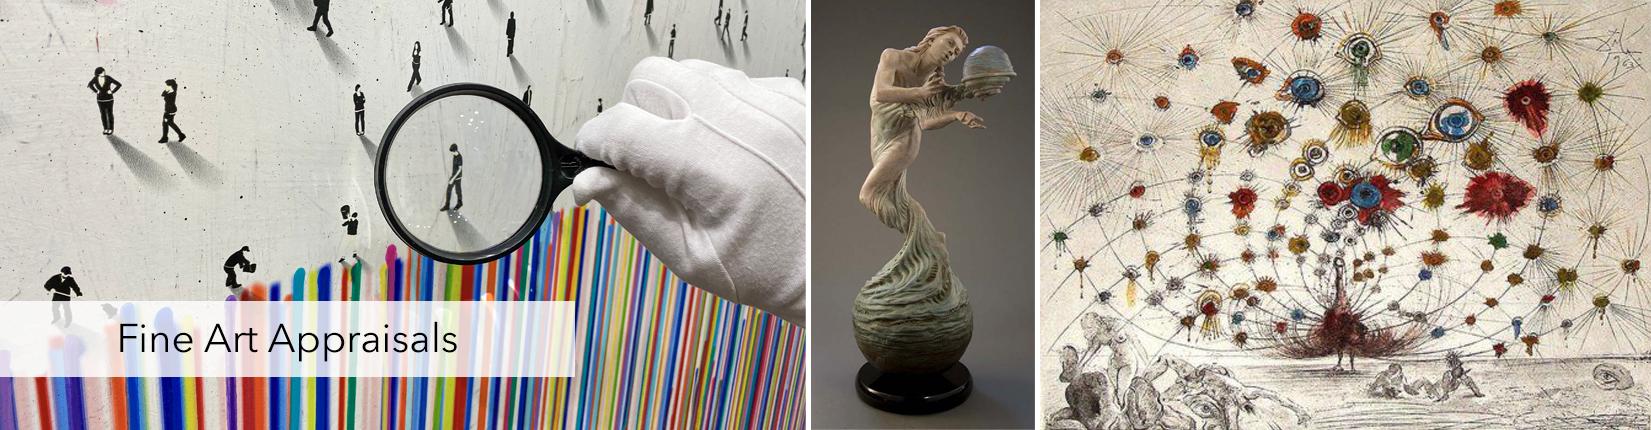 Art Leaders Gallery Fine Art Appraisals